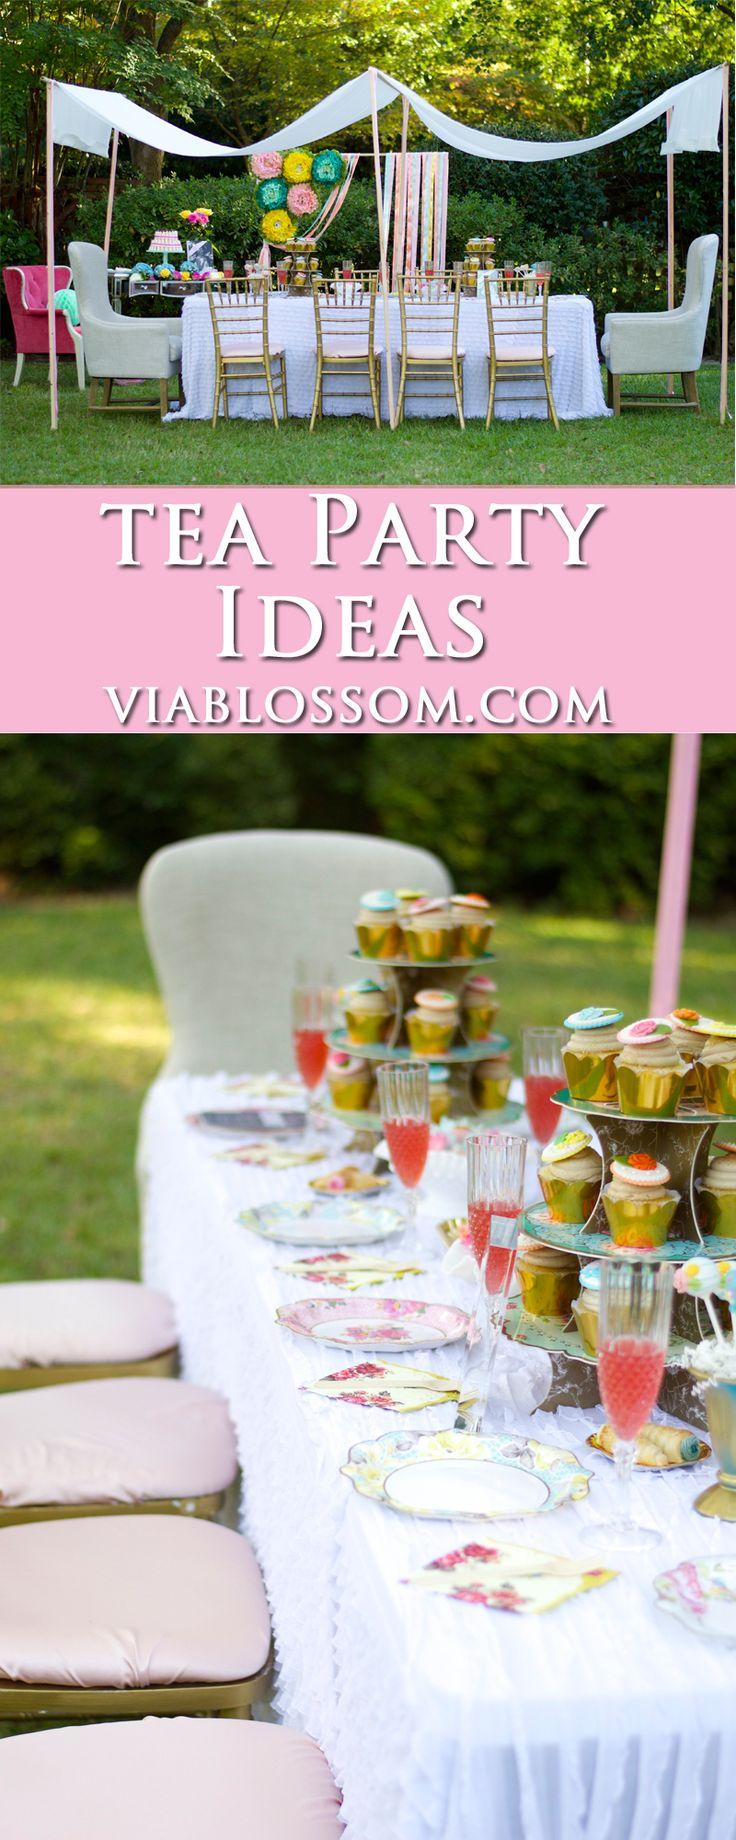 207 best Tea Party Ideas images on Pinterest   Recipes, Desserts ...